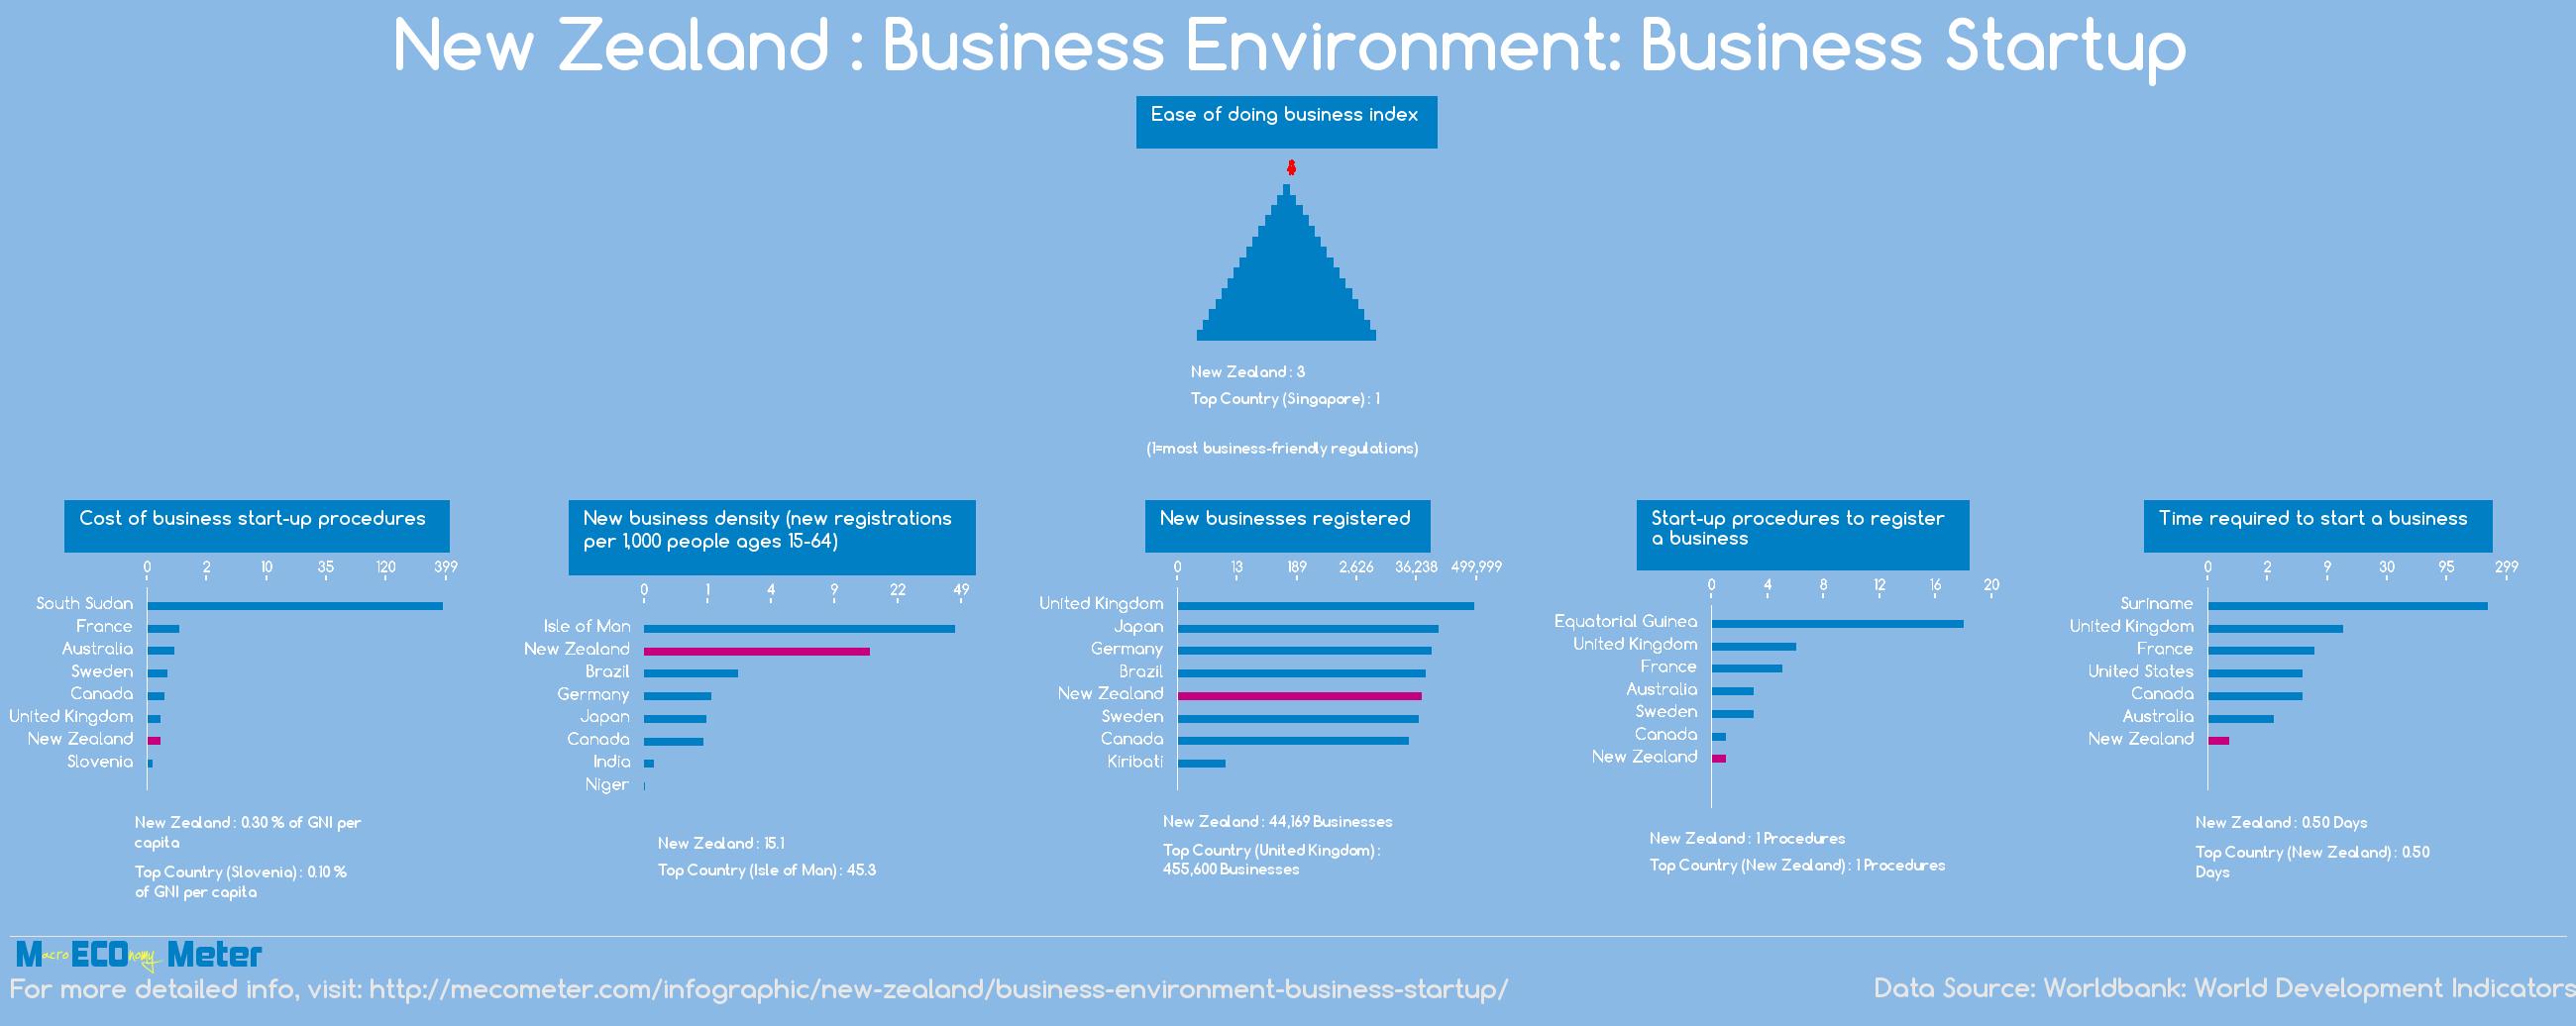 New Zealand : Business Environment: Business Startup